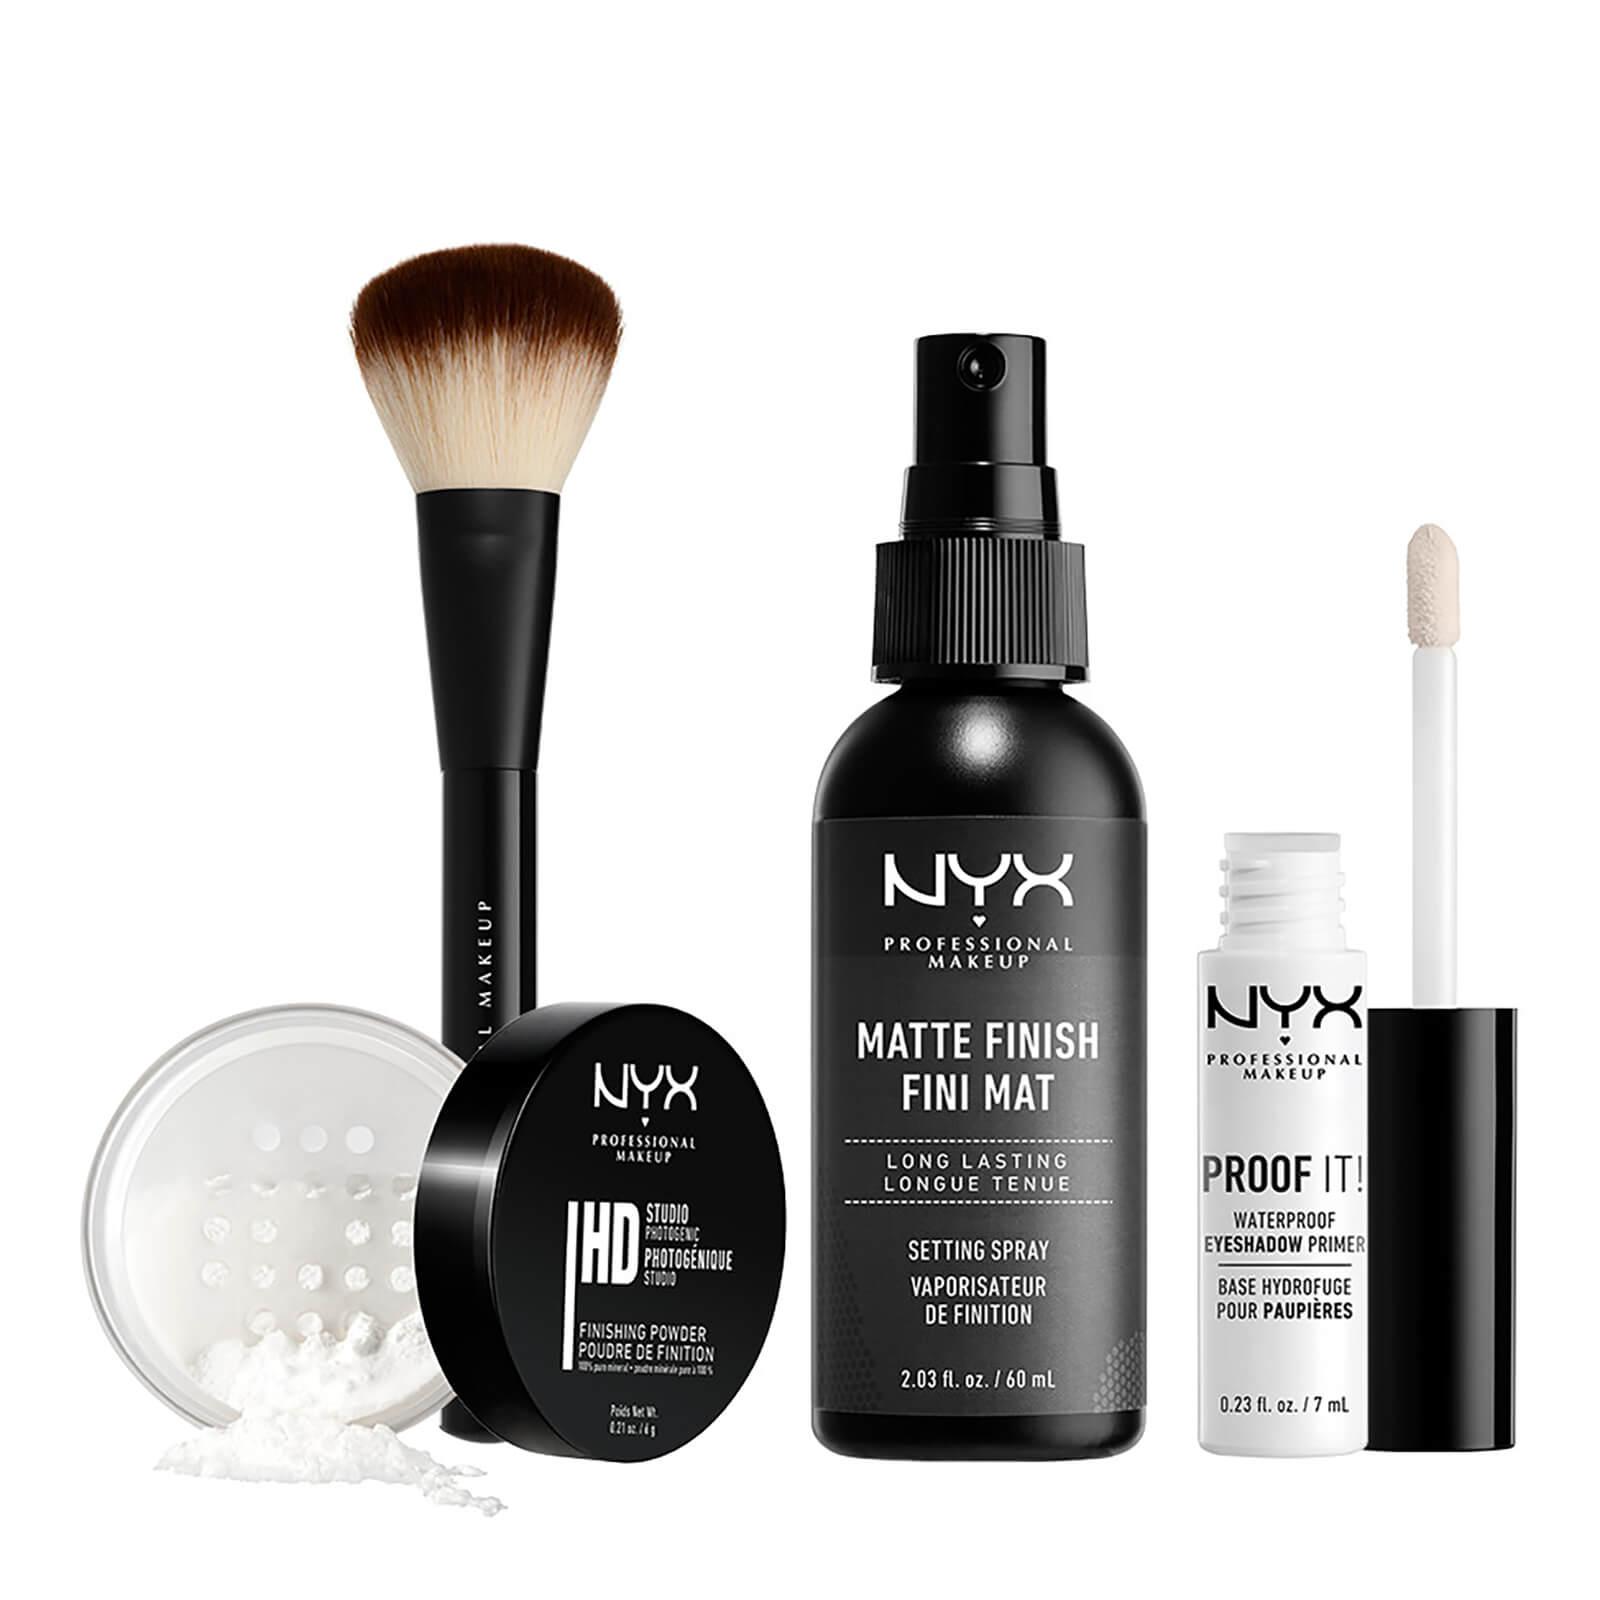 nyx professional makeup ultimate finish setting kit (worth £36.00)